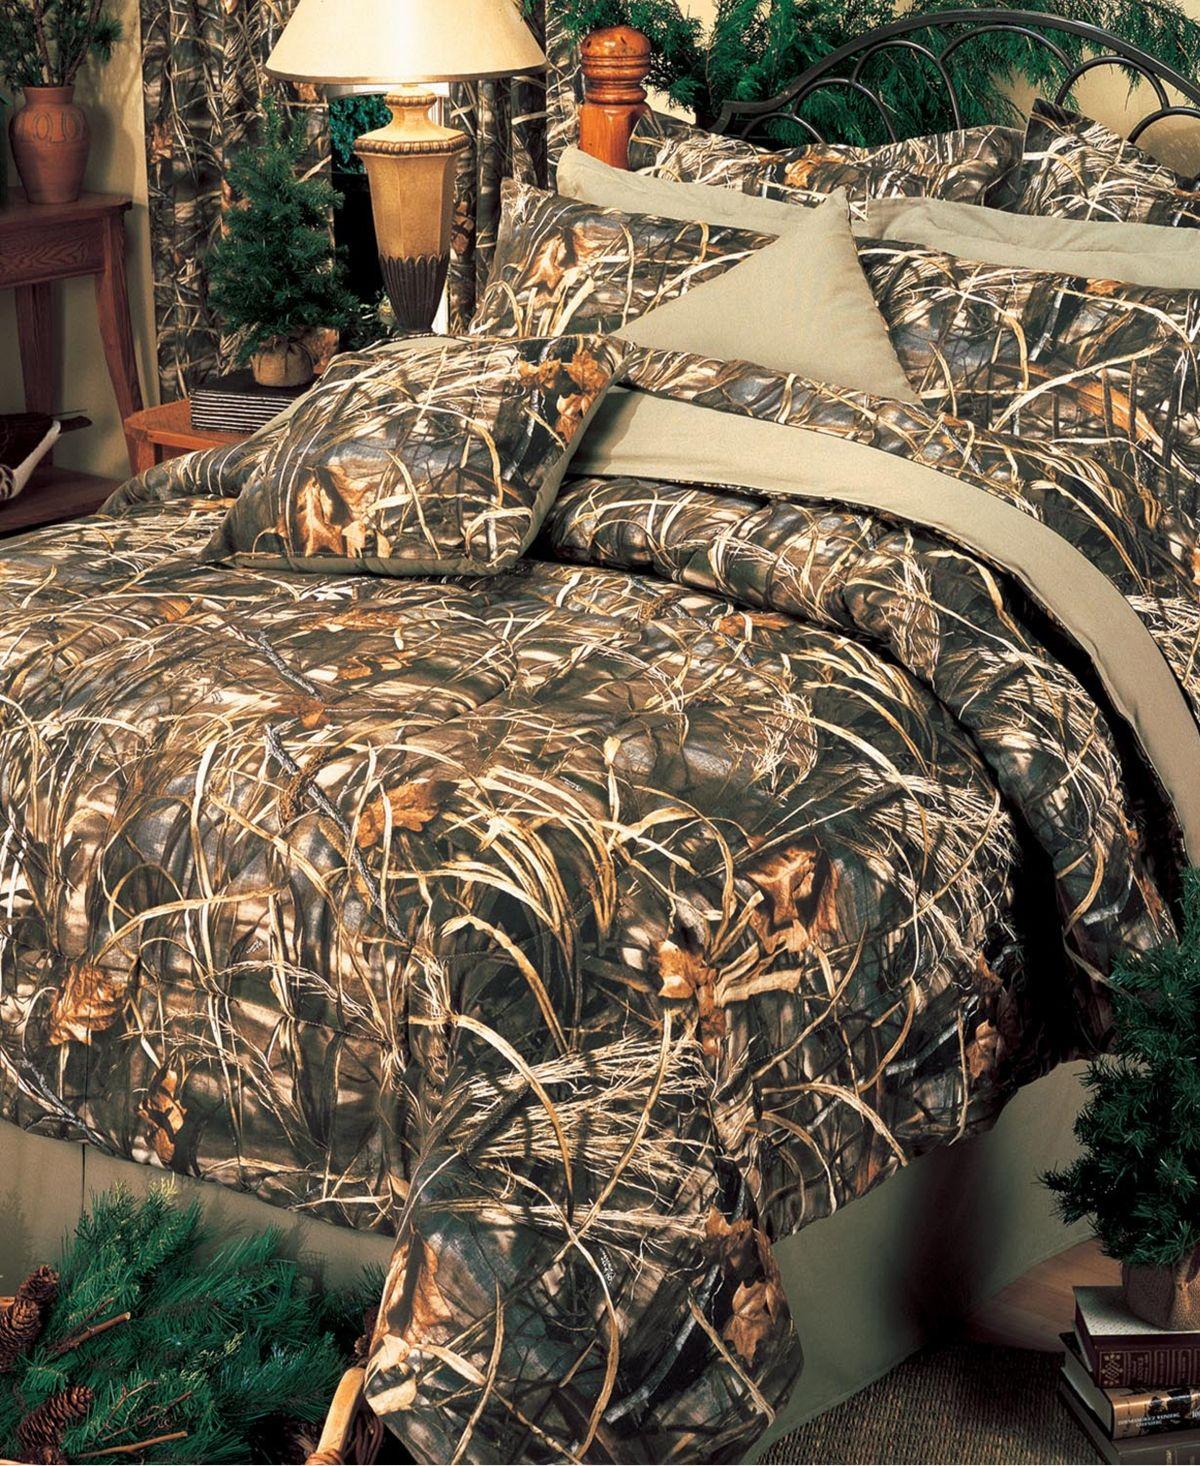 Karin Maki Realtree Max 4 Twin Comforter Set Reviews Bed In A